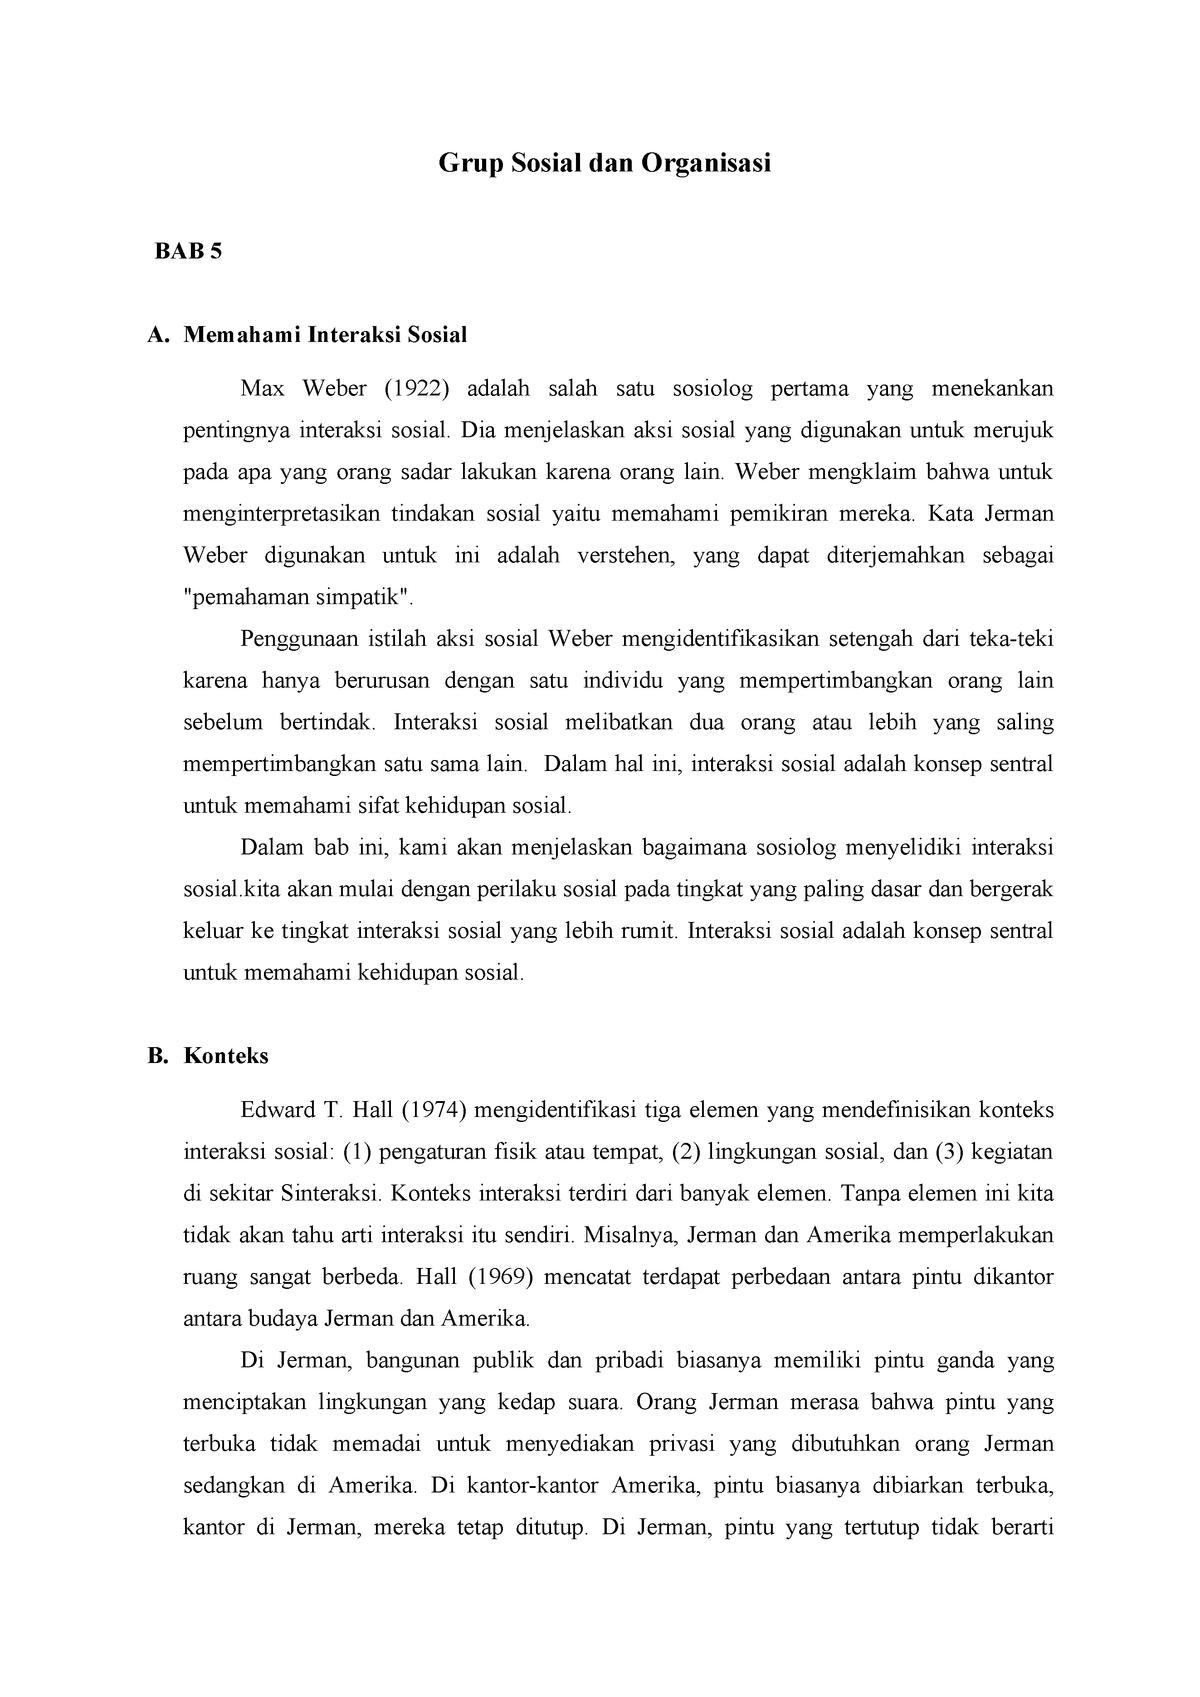 Arti Dari Kata Date Adalah  Arti Ghurfatul Julus Istiqbali Akli Mudakaroti Ghurfatun Naumi ...